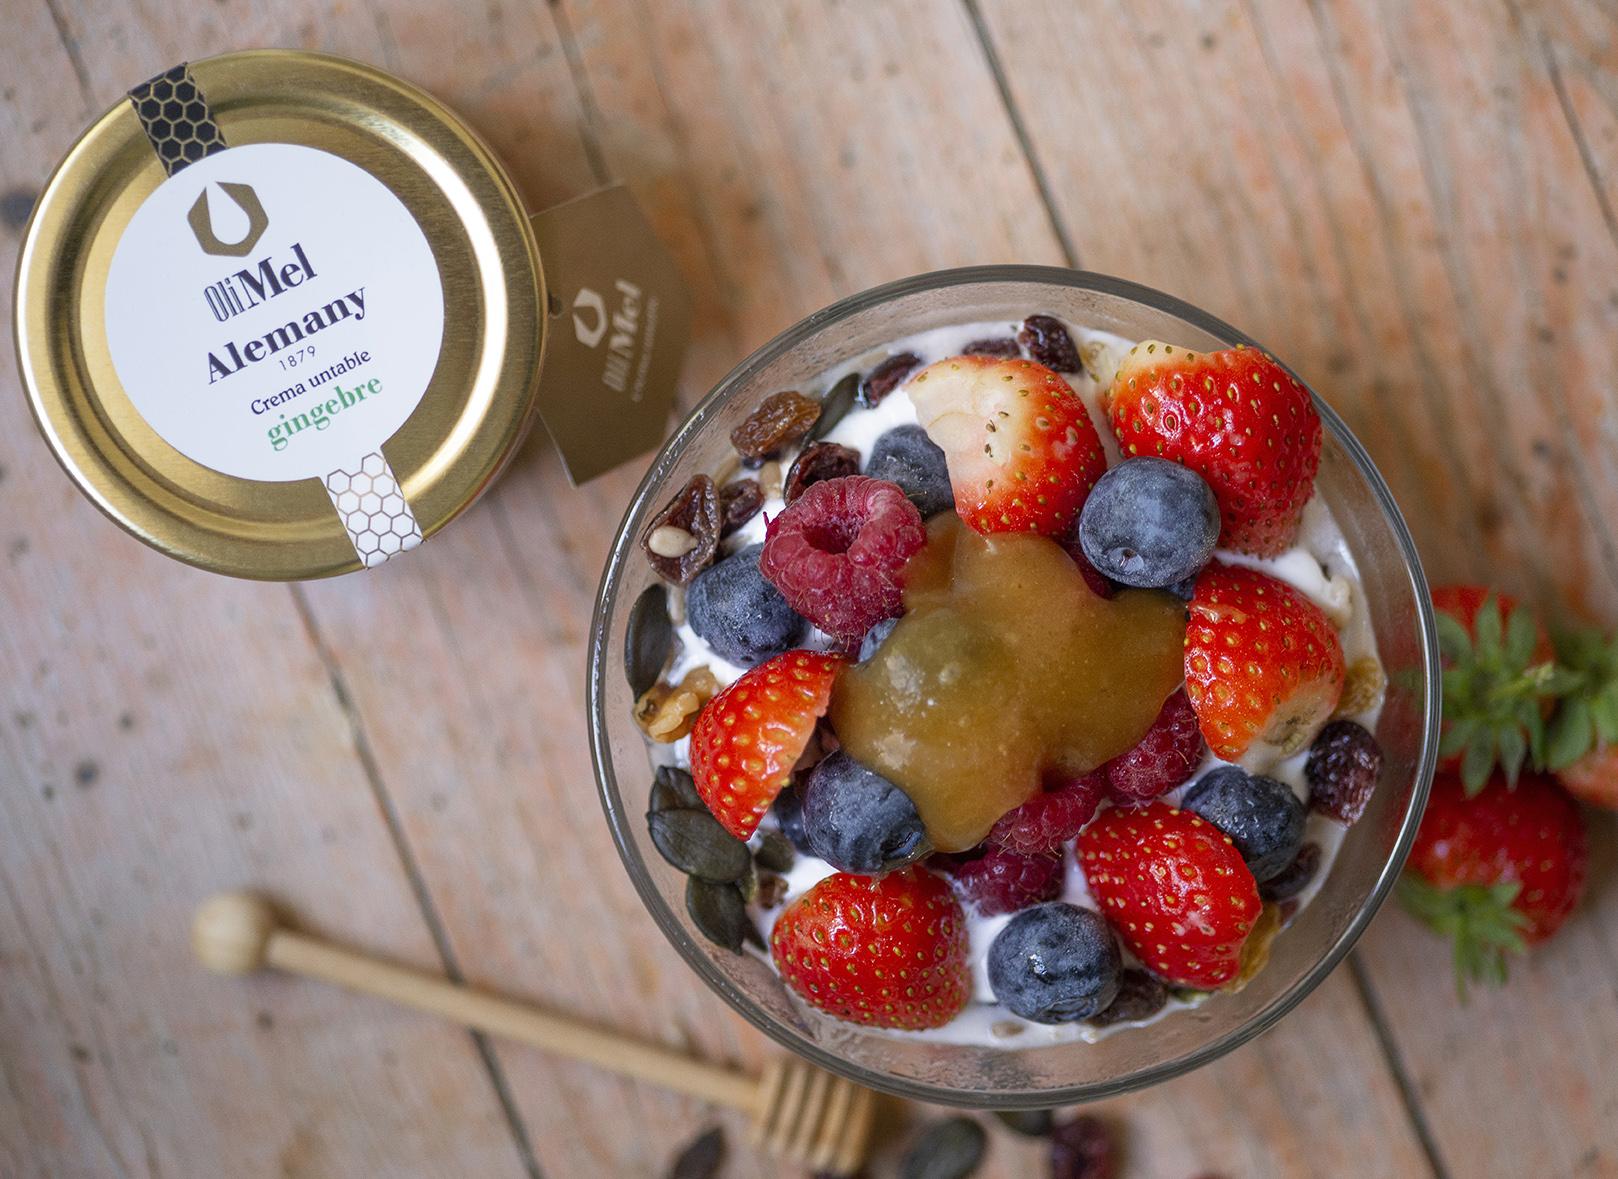 Iogurt, granola, fruita i OliMel amb gingebre